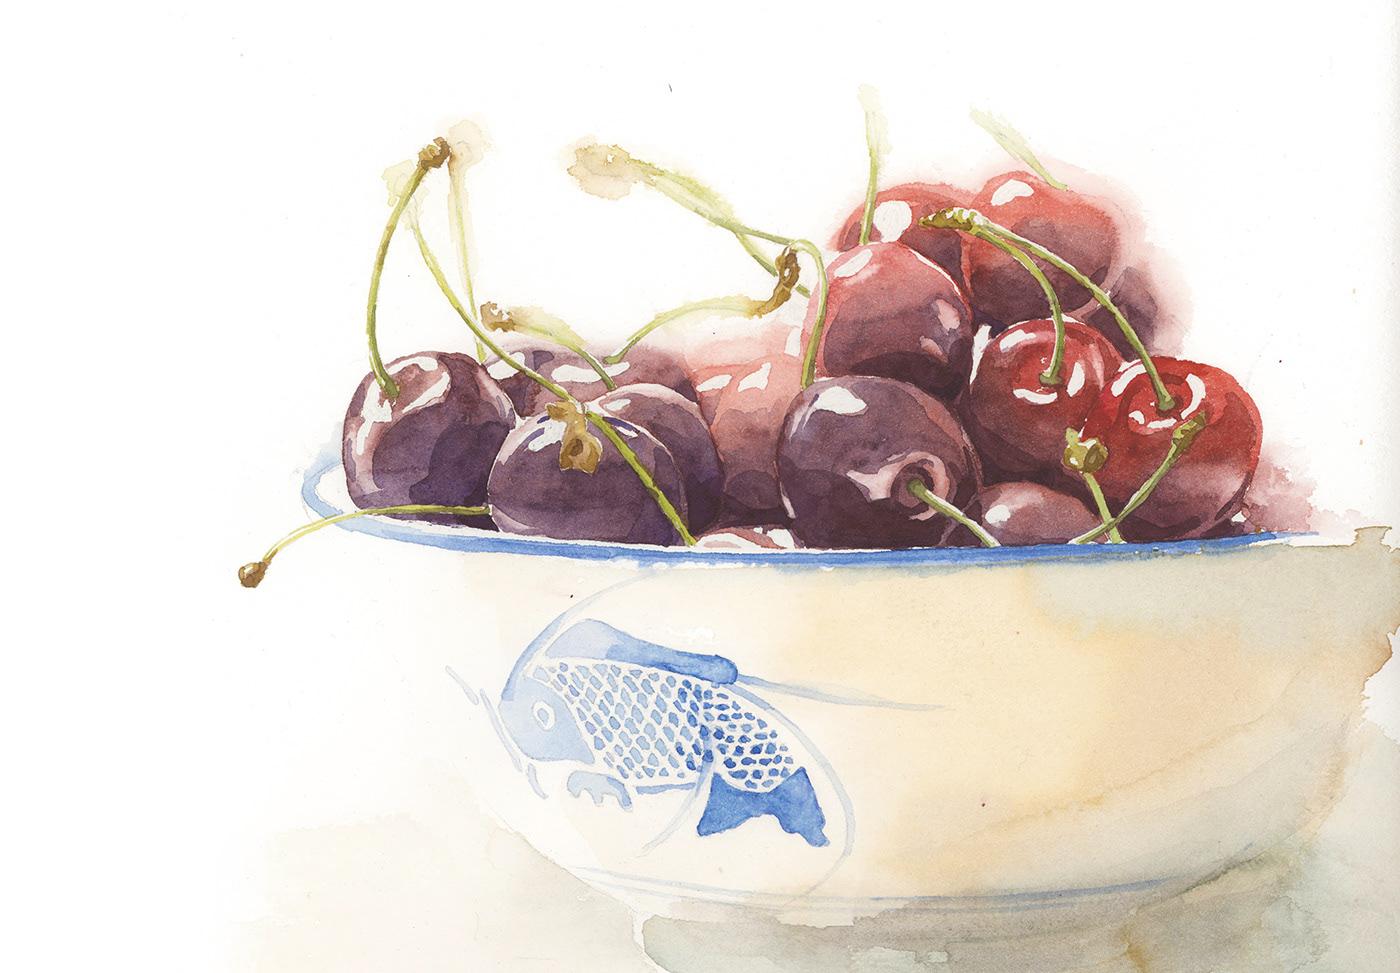 Image may contain: food and drawing